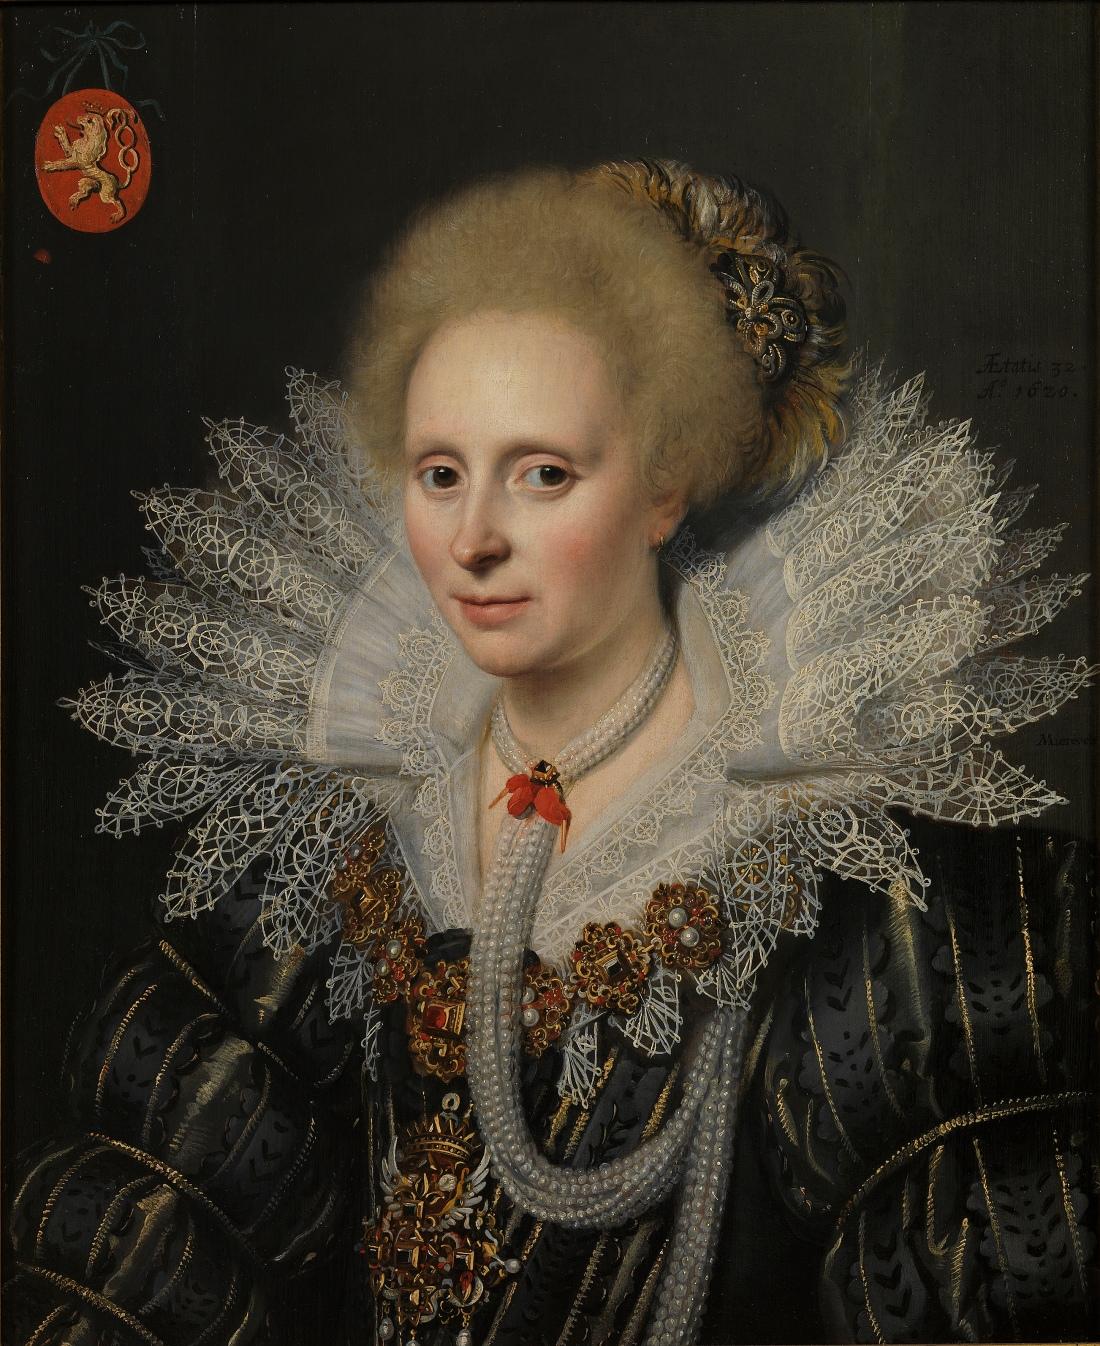 Probably Theodora van Duvenvoorde. 1620.